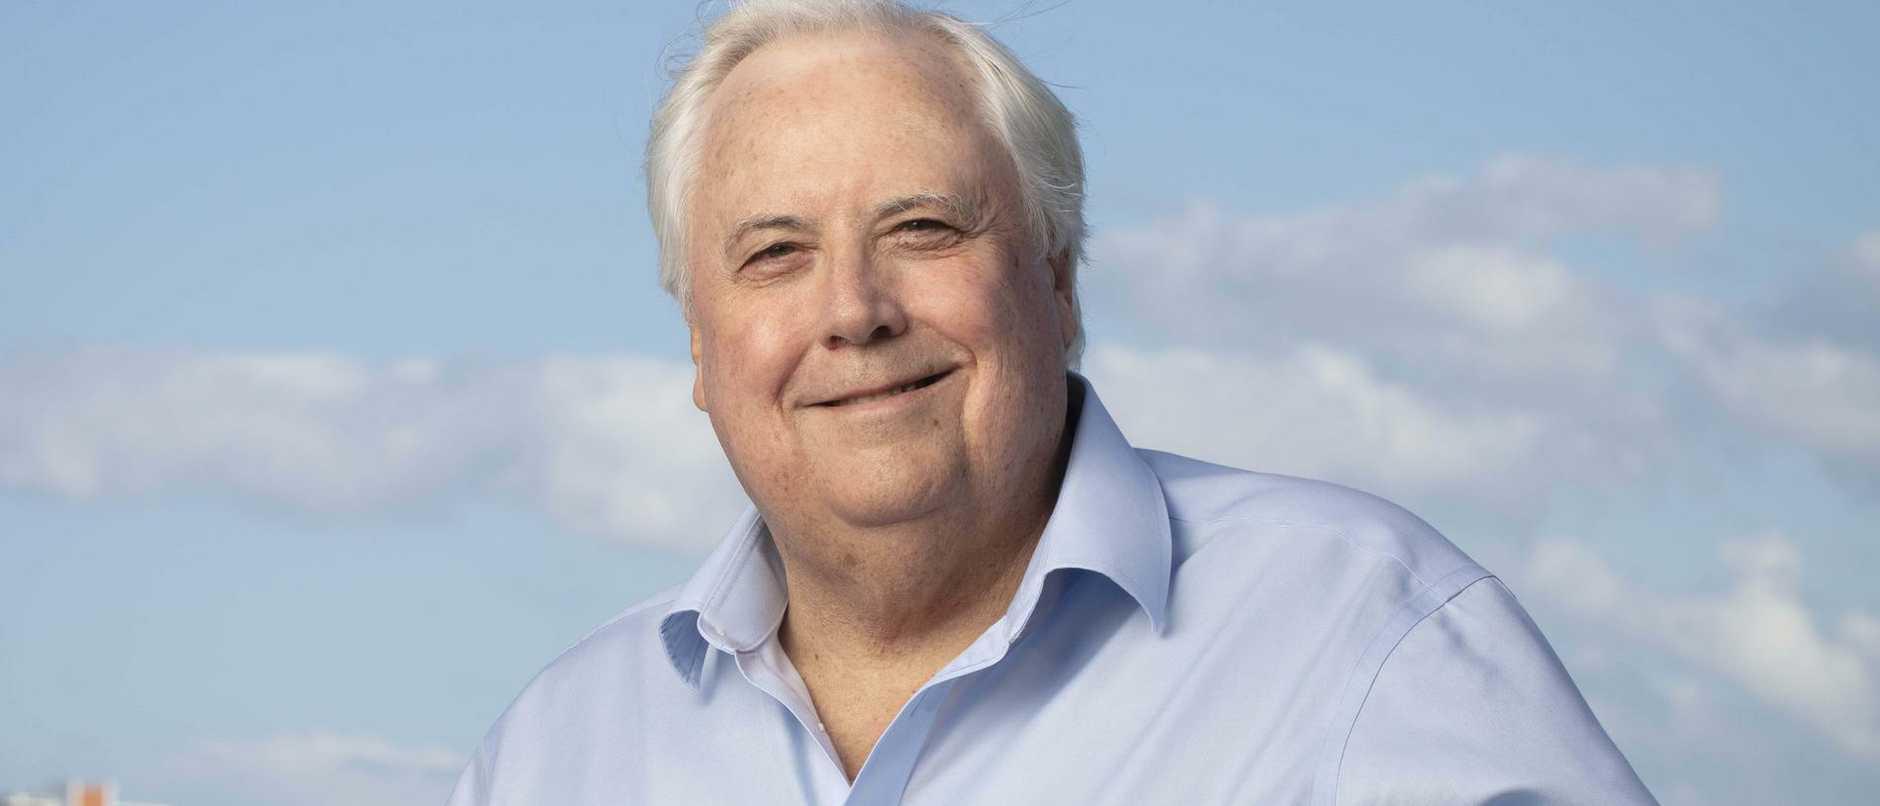 Clive Palmer